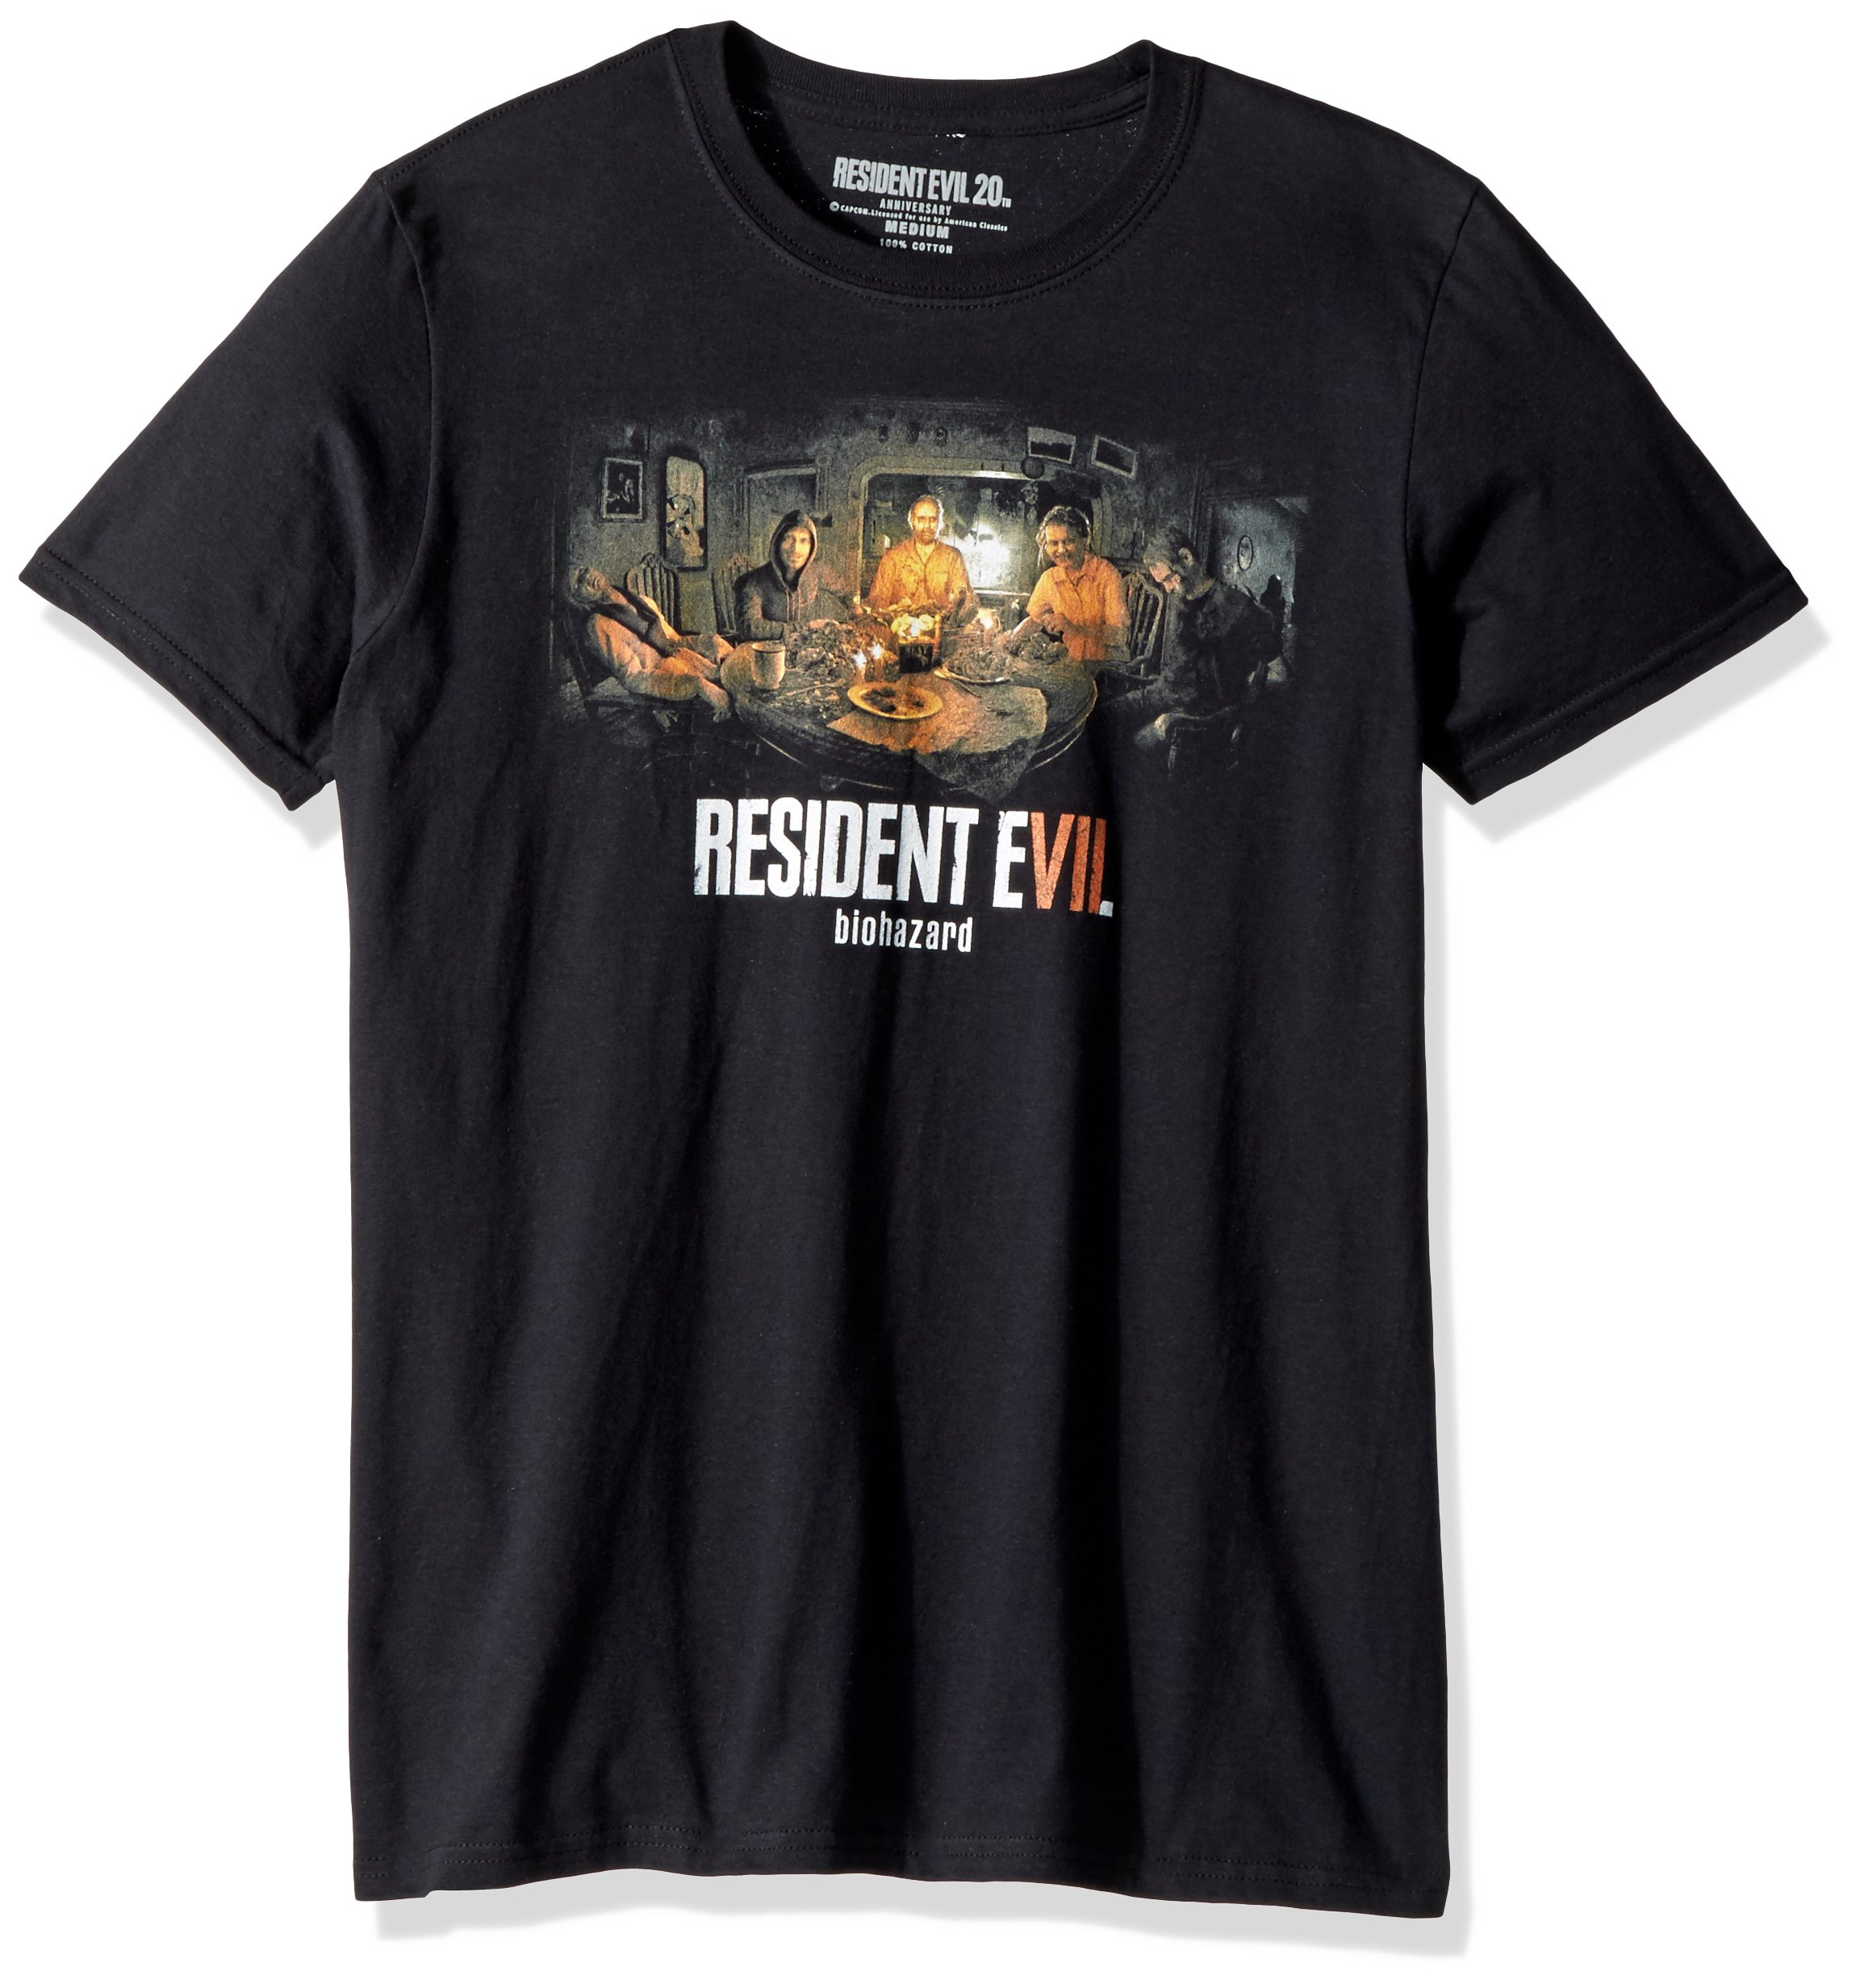 Resident Evil Biohazard Adult Short Sleeve Shirts